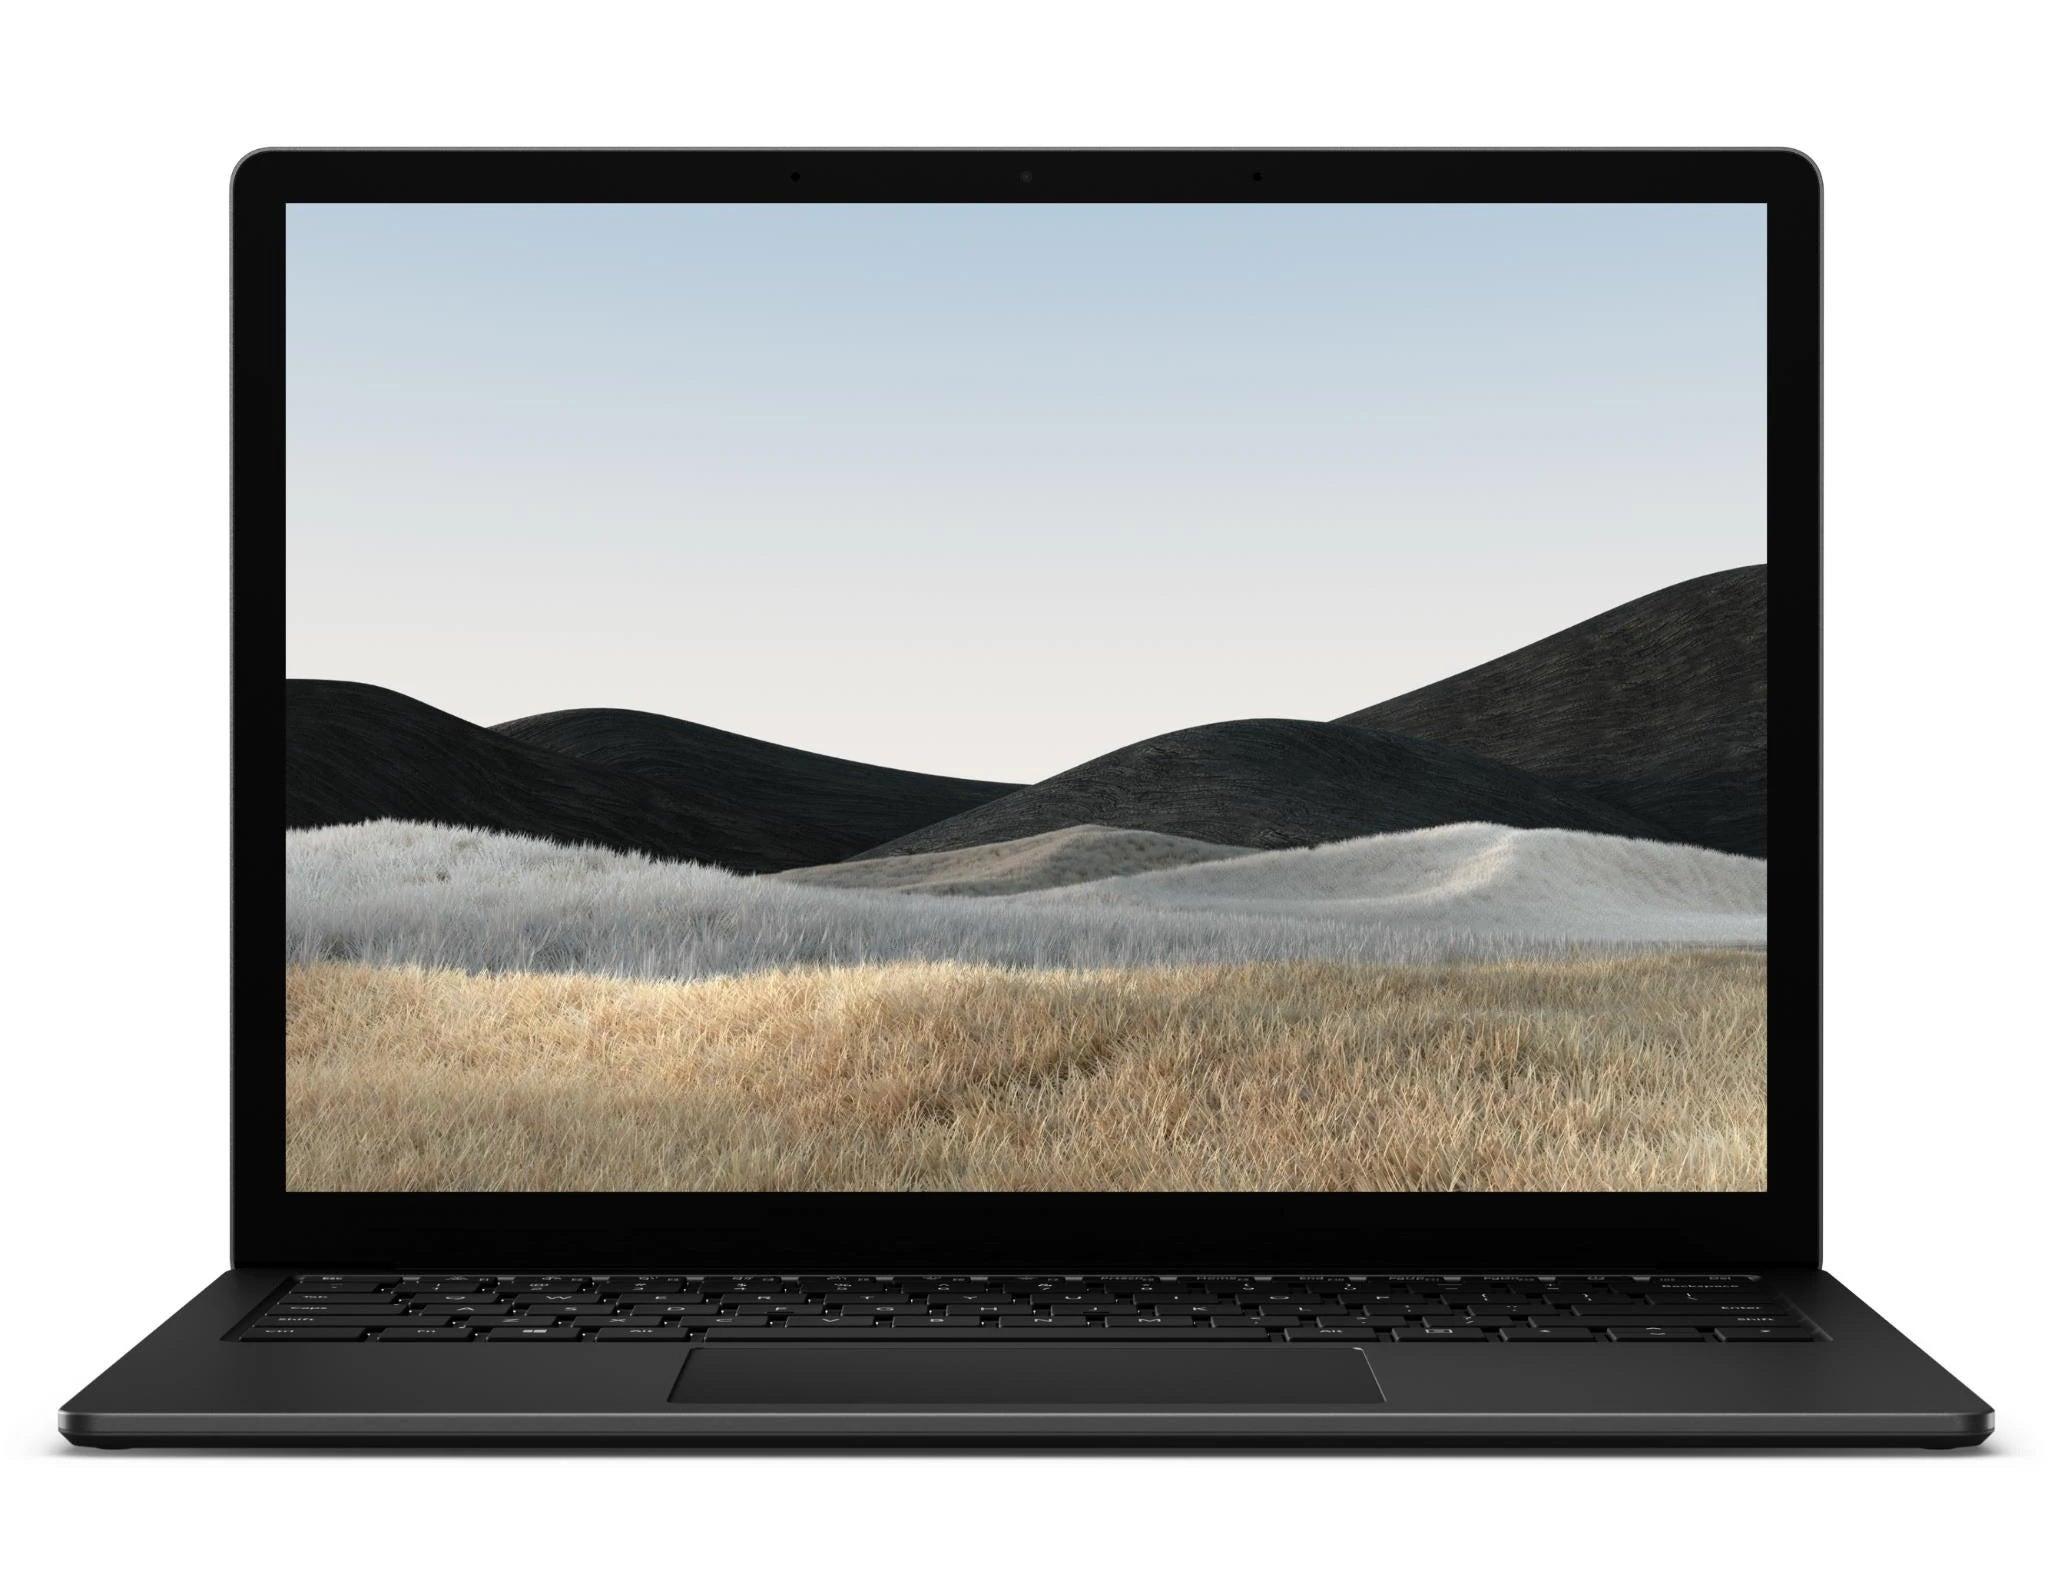 Microsoft Surface Laptop 4 13 inch Laptop